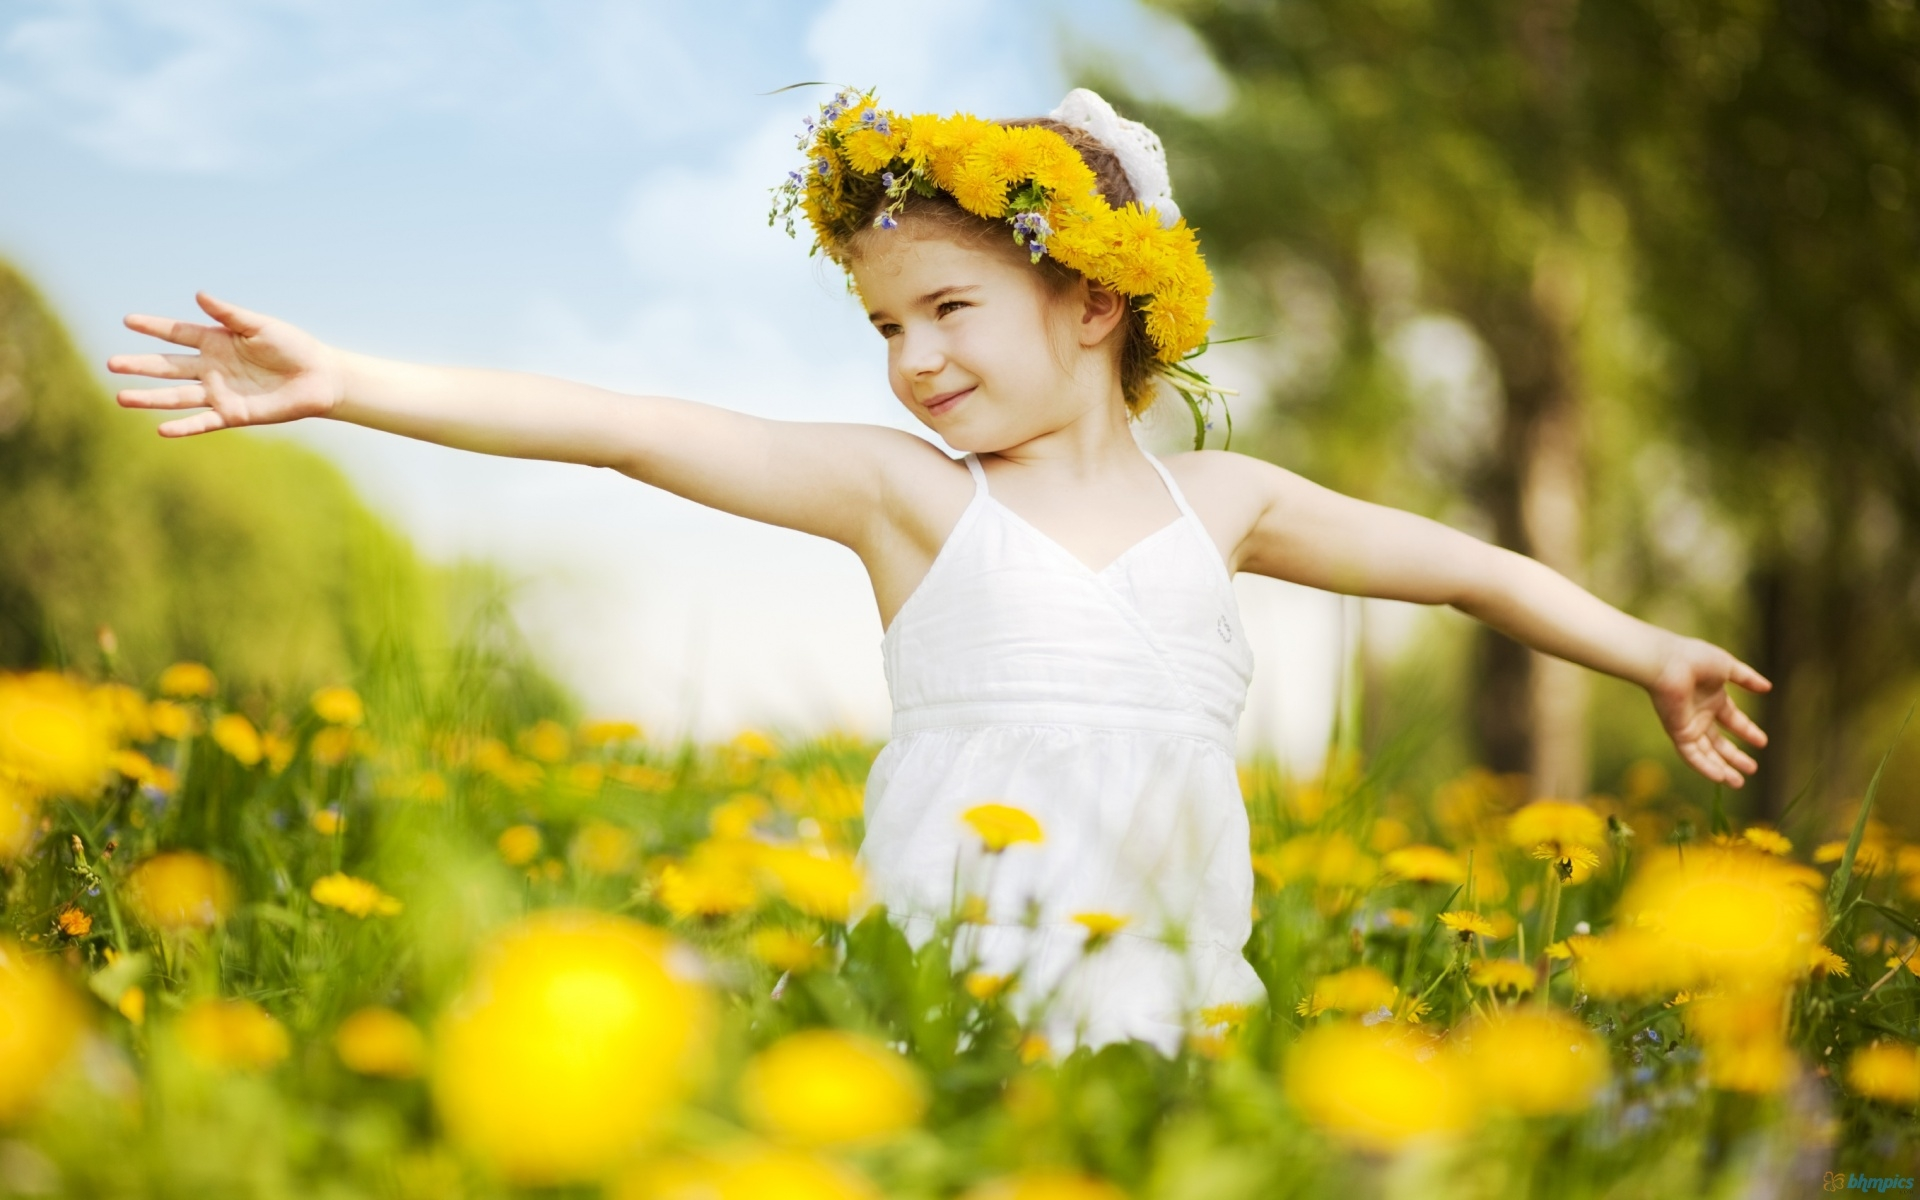 Cute Baby Pics For Whatsapp Wallpaper Cute Wallpapers For Girls Pixelstalk Net